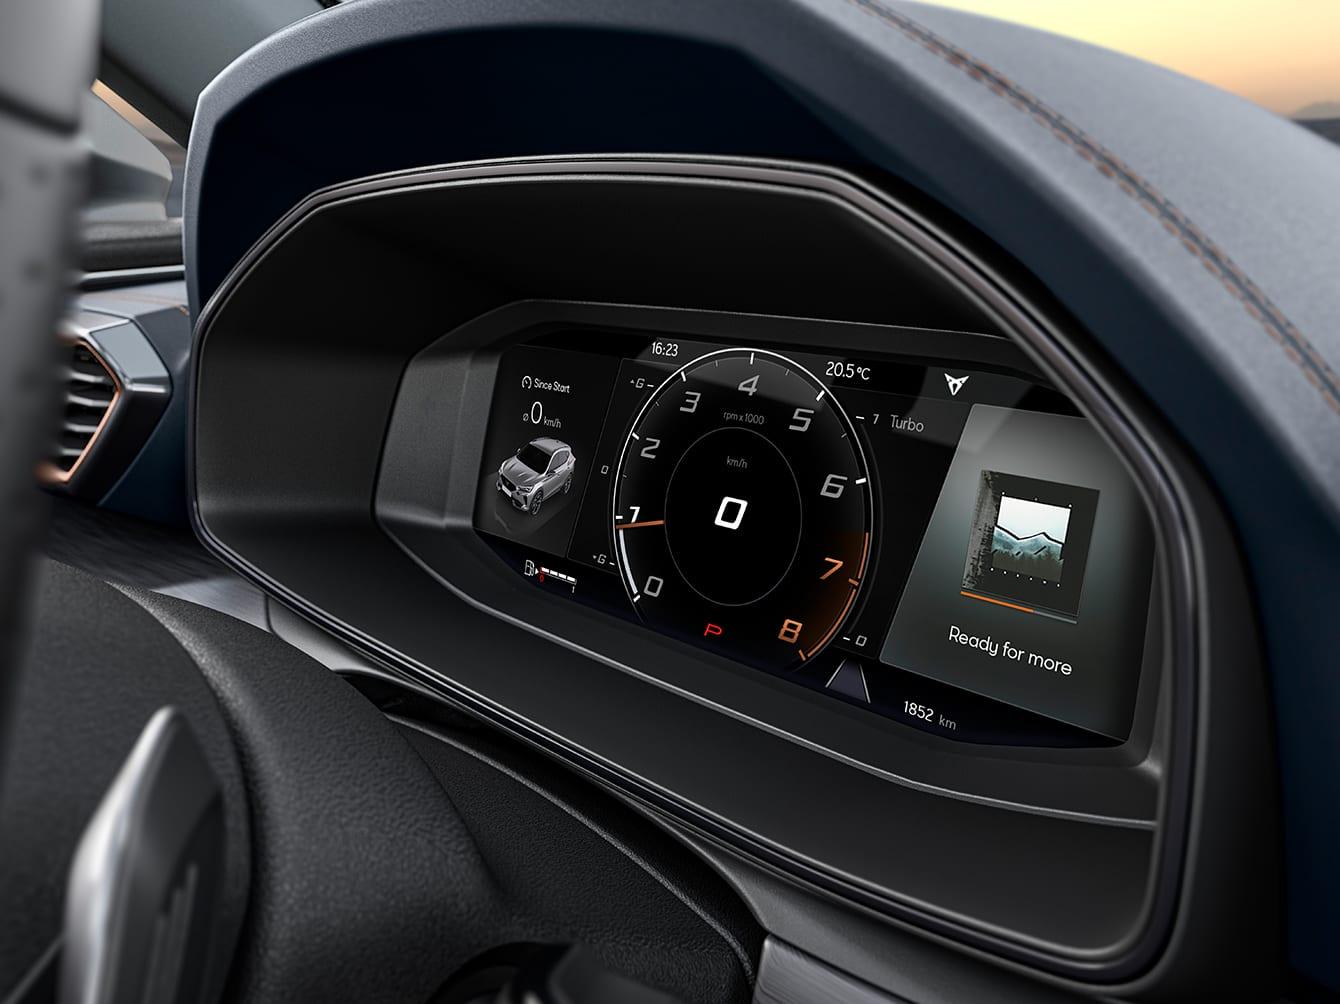 neuer cupra formentor, digitales cockpit mit 10.2-zoll-display